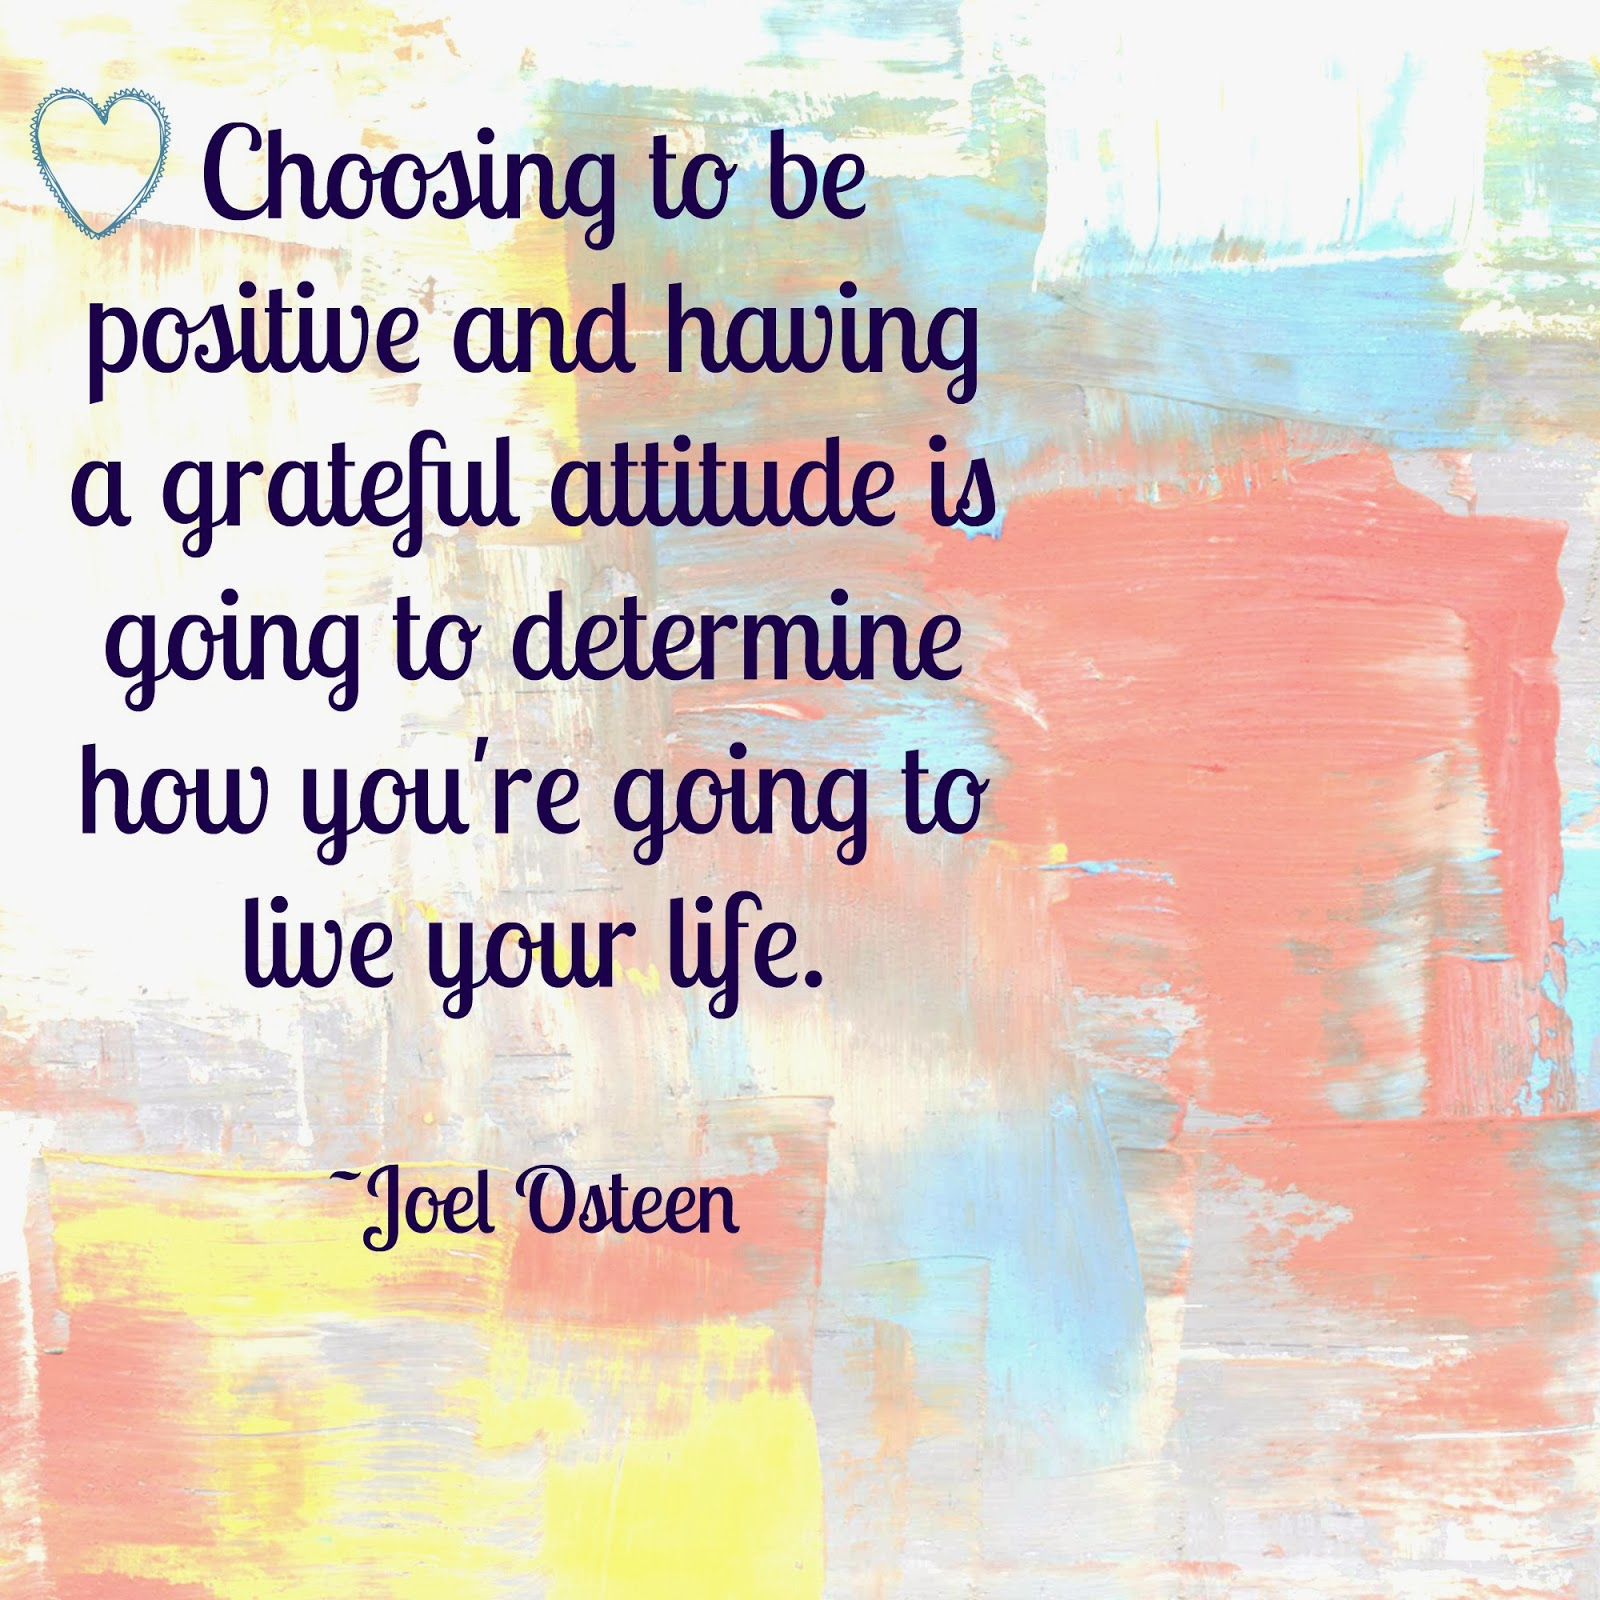 Joel Osteen Positive Thinking Quotes: Joel Osteen Encouragement Quotes. QuotesGram